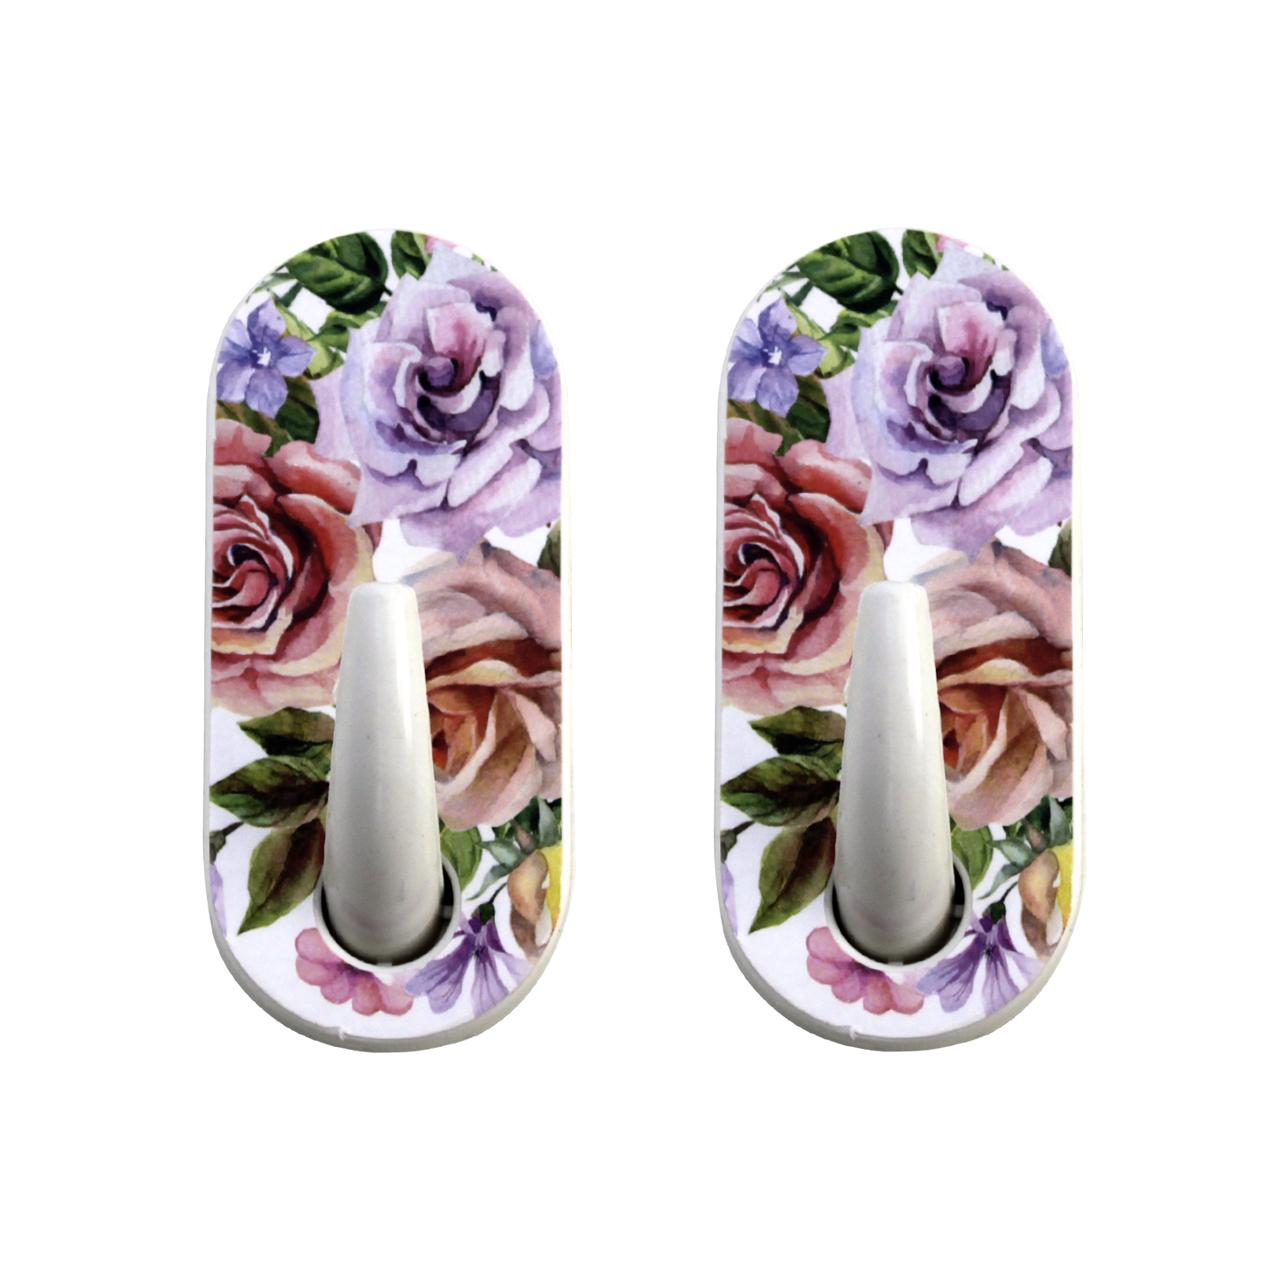 قلاب آویز سان فلاور مدل Garden بسته 2 عددی